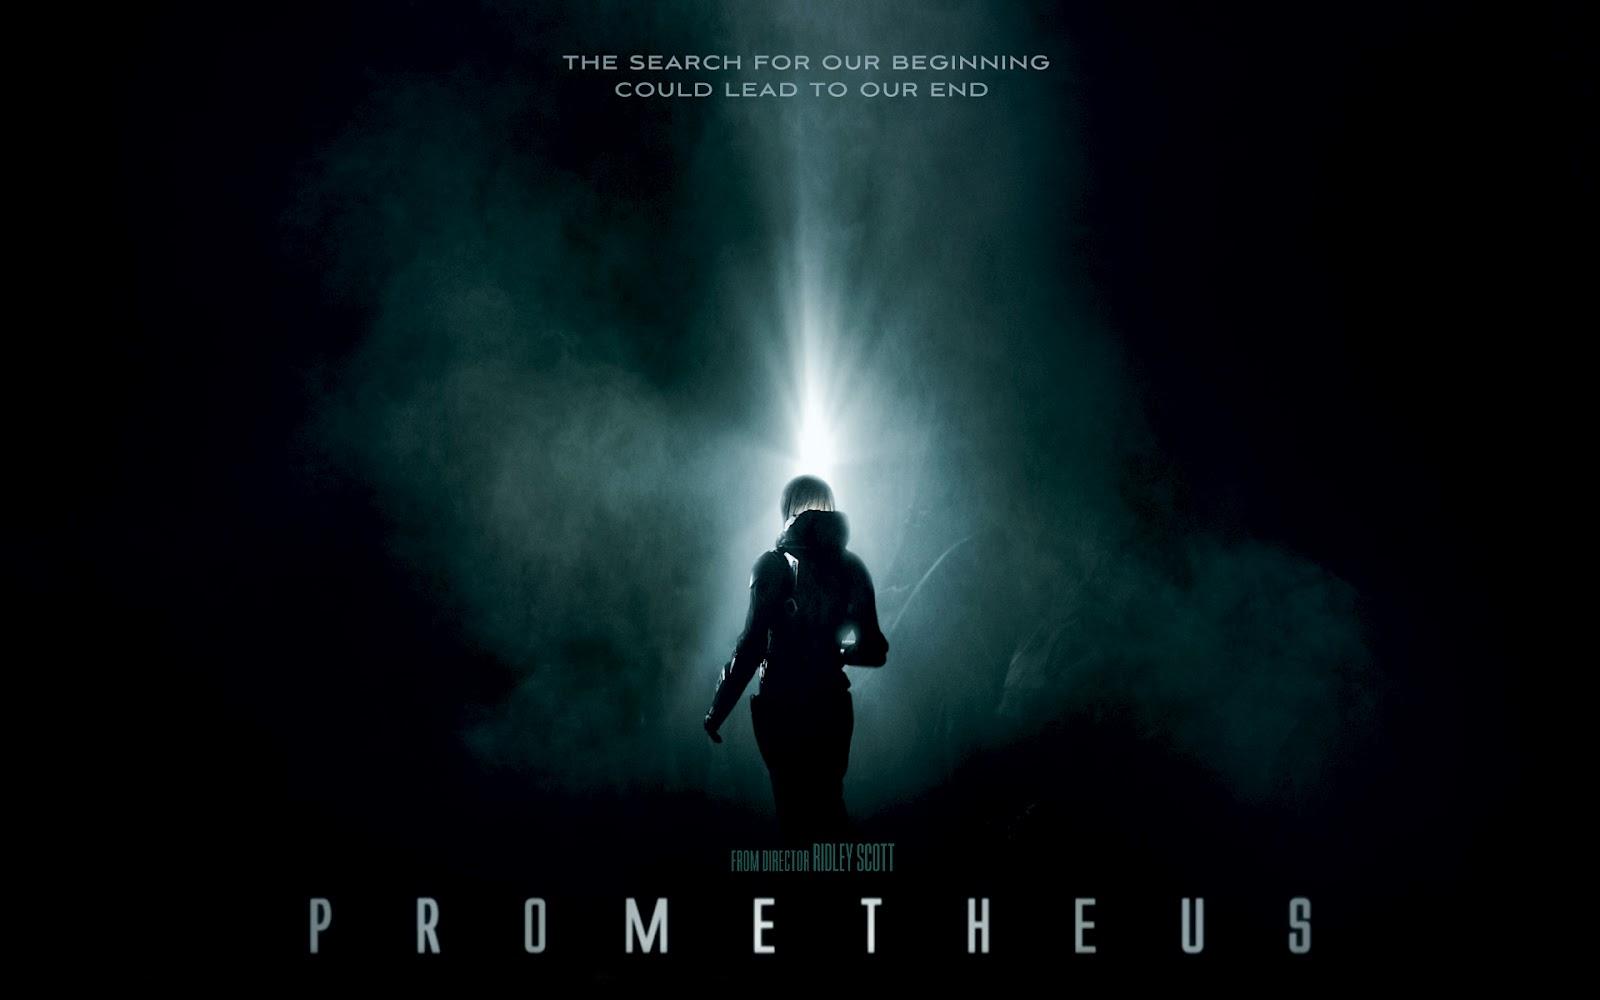 http://1.bp.blogspot.com/-76HCtfTz6MU/T6yVeiPo_II/AAAAAAAACEo/-HG0MqNmtD0/s1600/Prometheus-2012-Movie.jpg